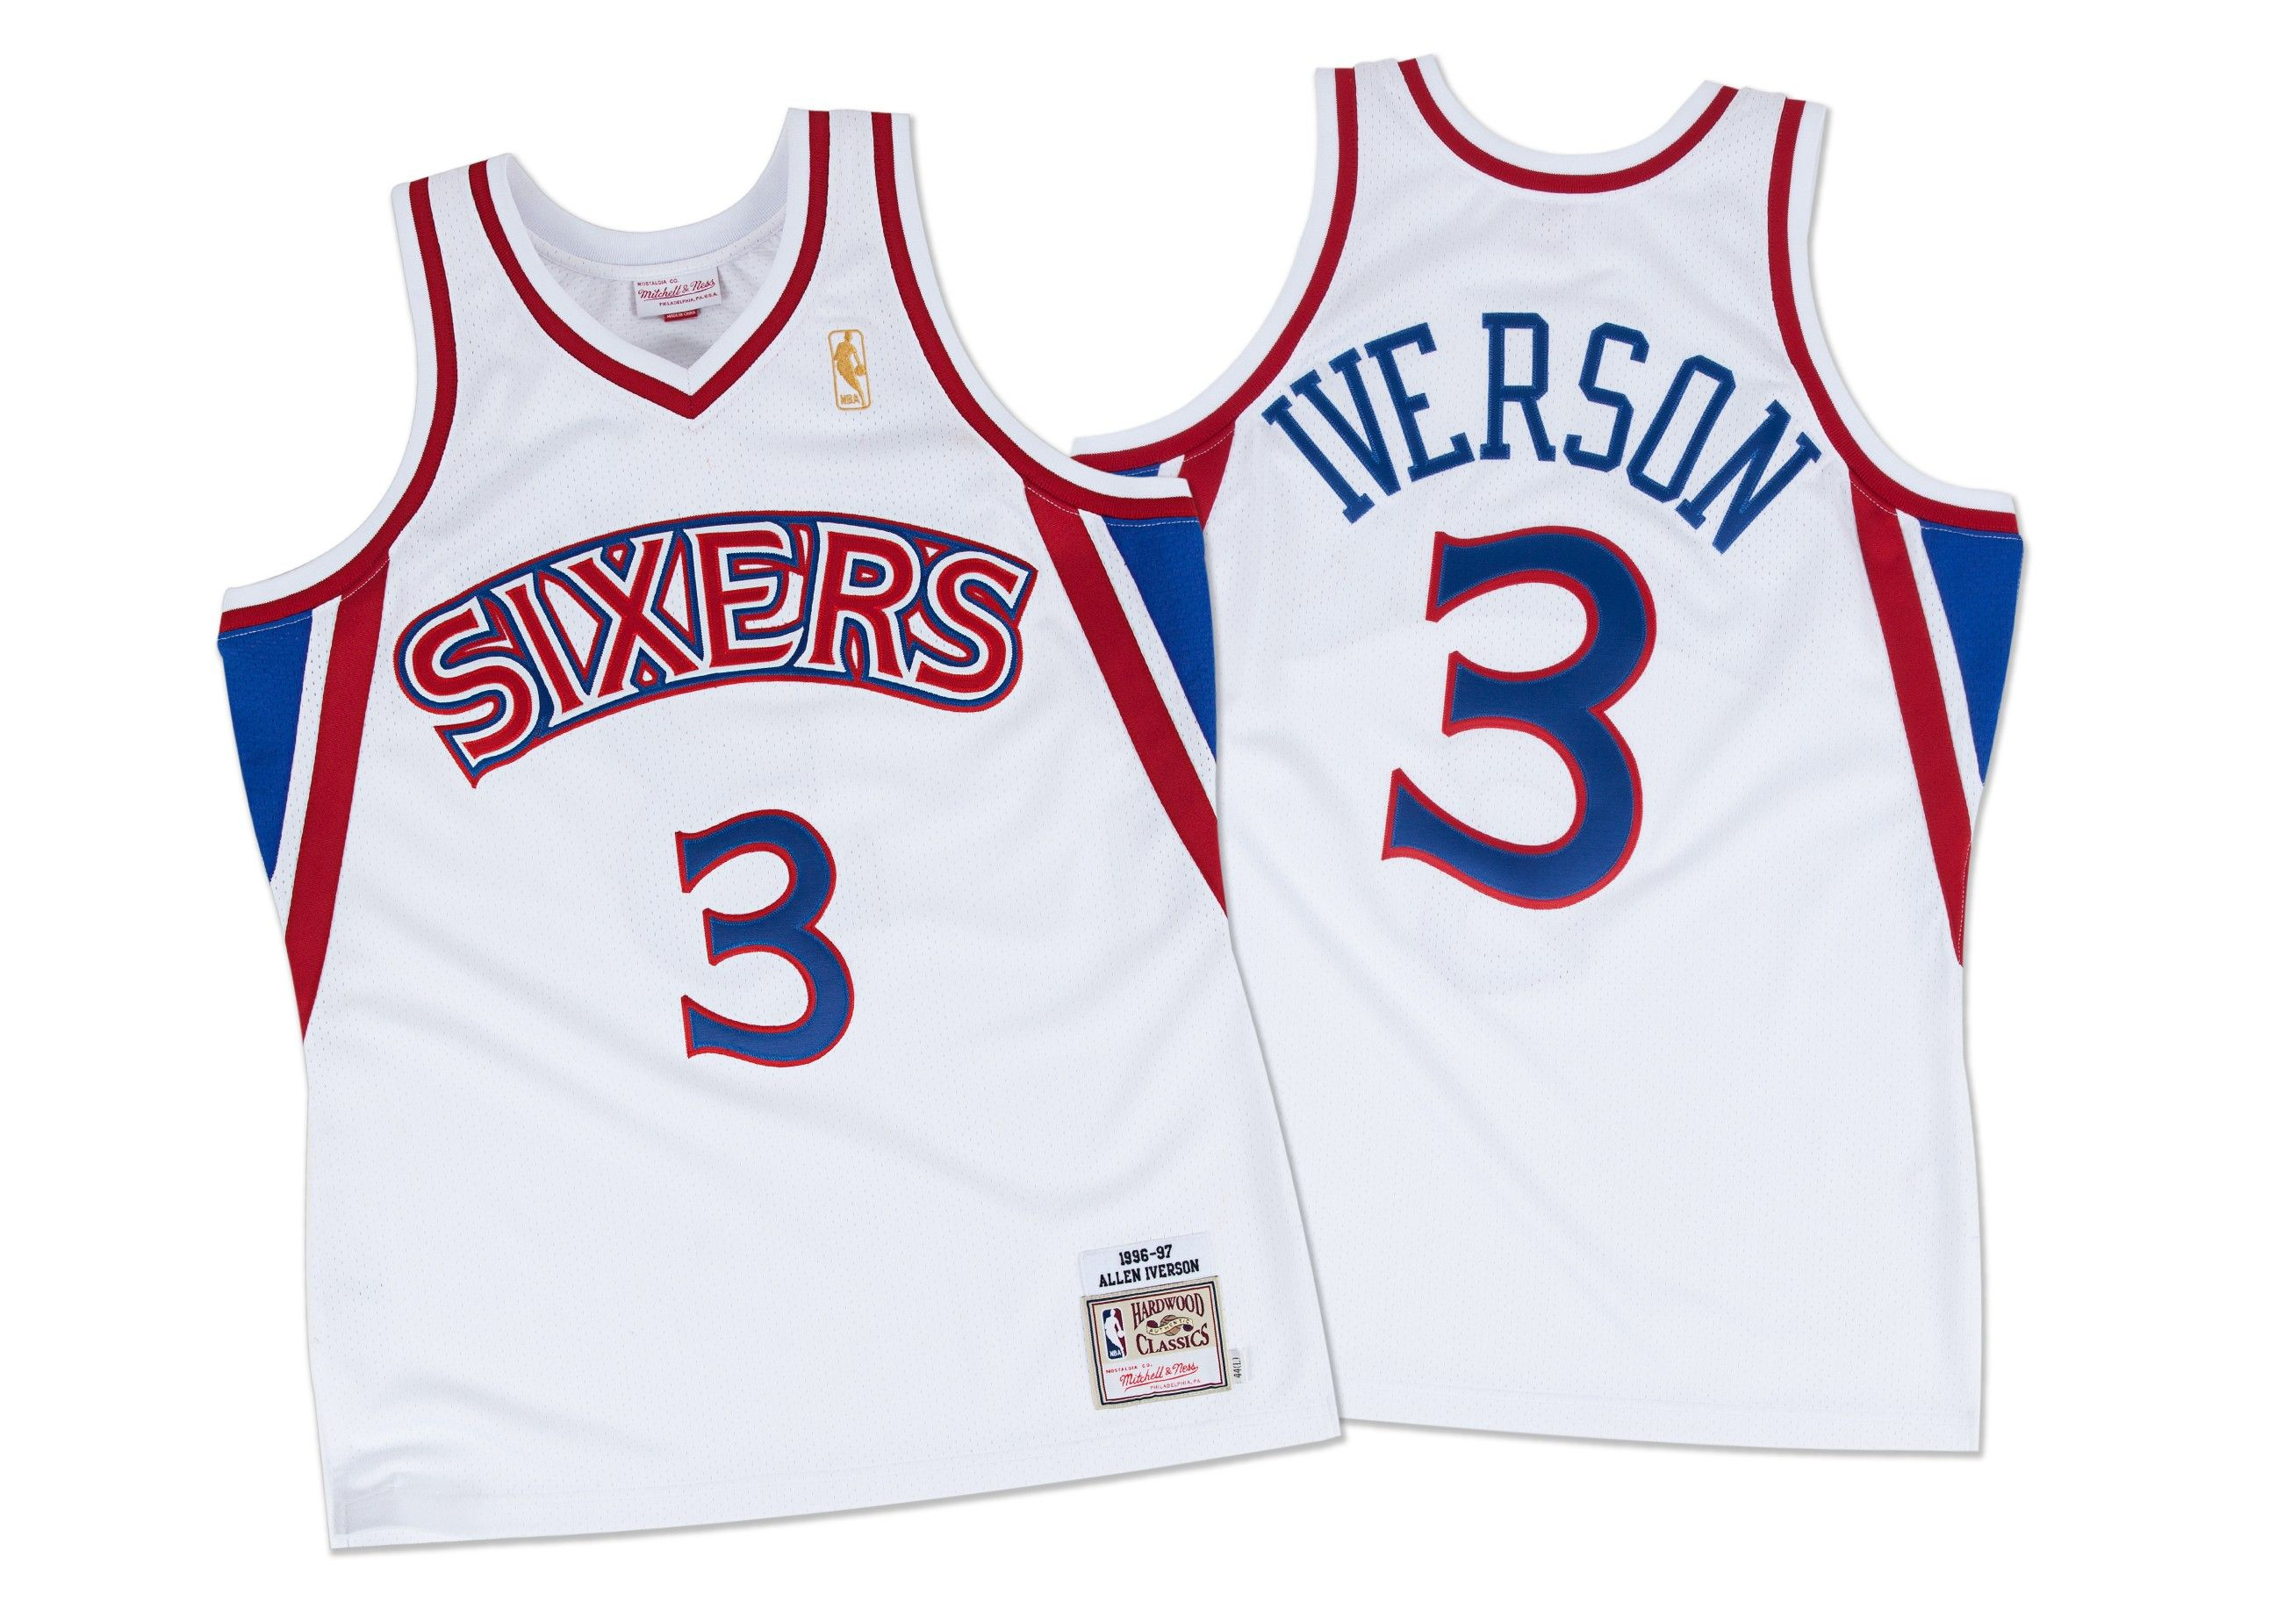 477d0485a Allen Iverson 1996-97 Authentic Jersey Philadelphia 76ers - Mitchell   Ness